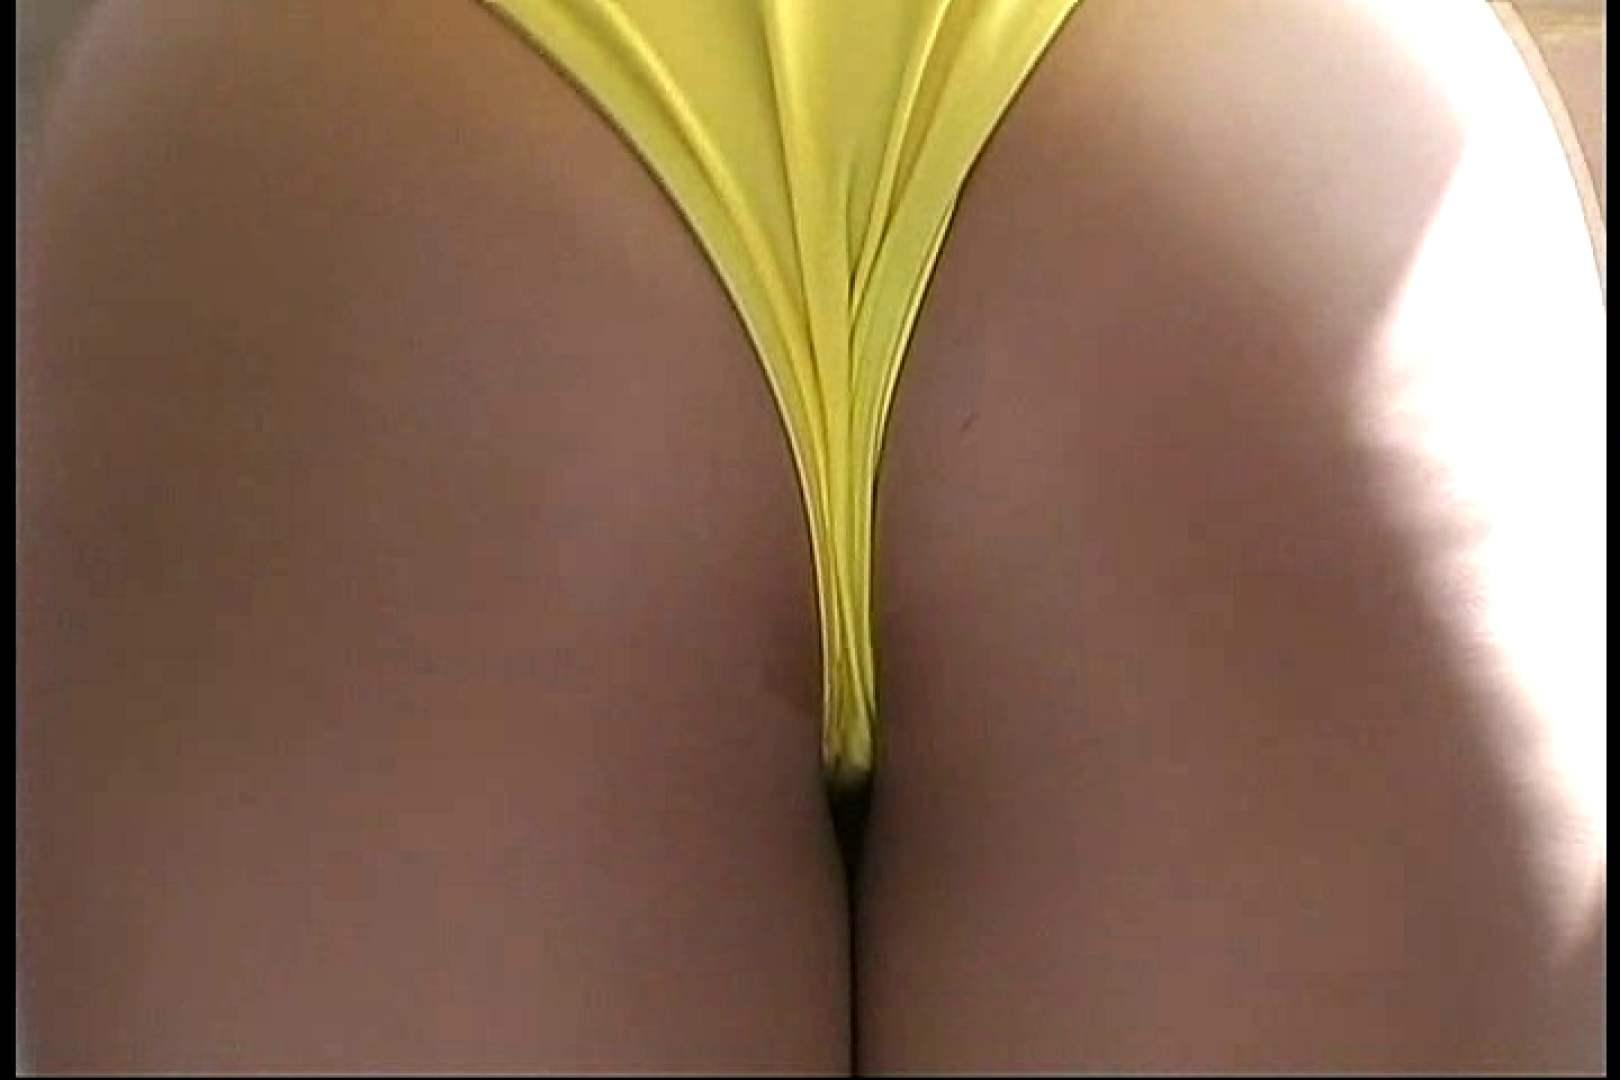 RQカメラ地獄Vol.7 コスチューム オマンコ動画キャプチャ 80画像 50